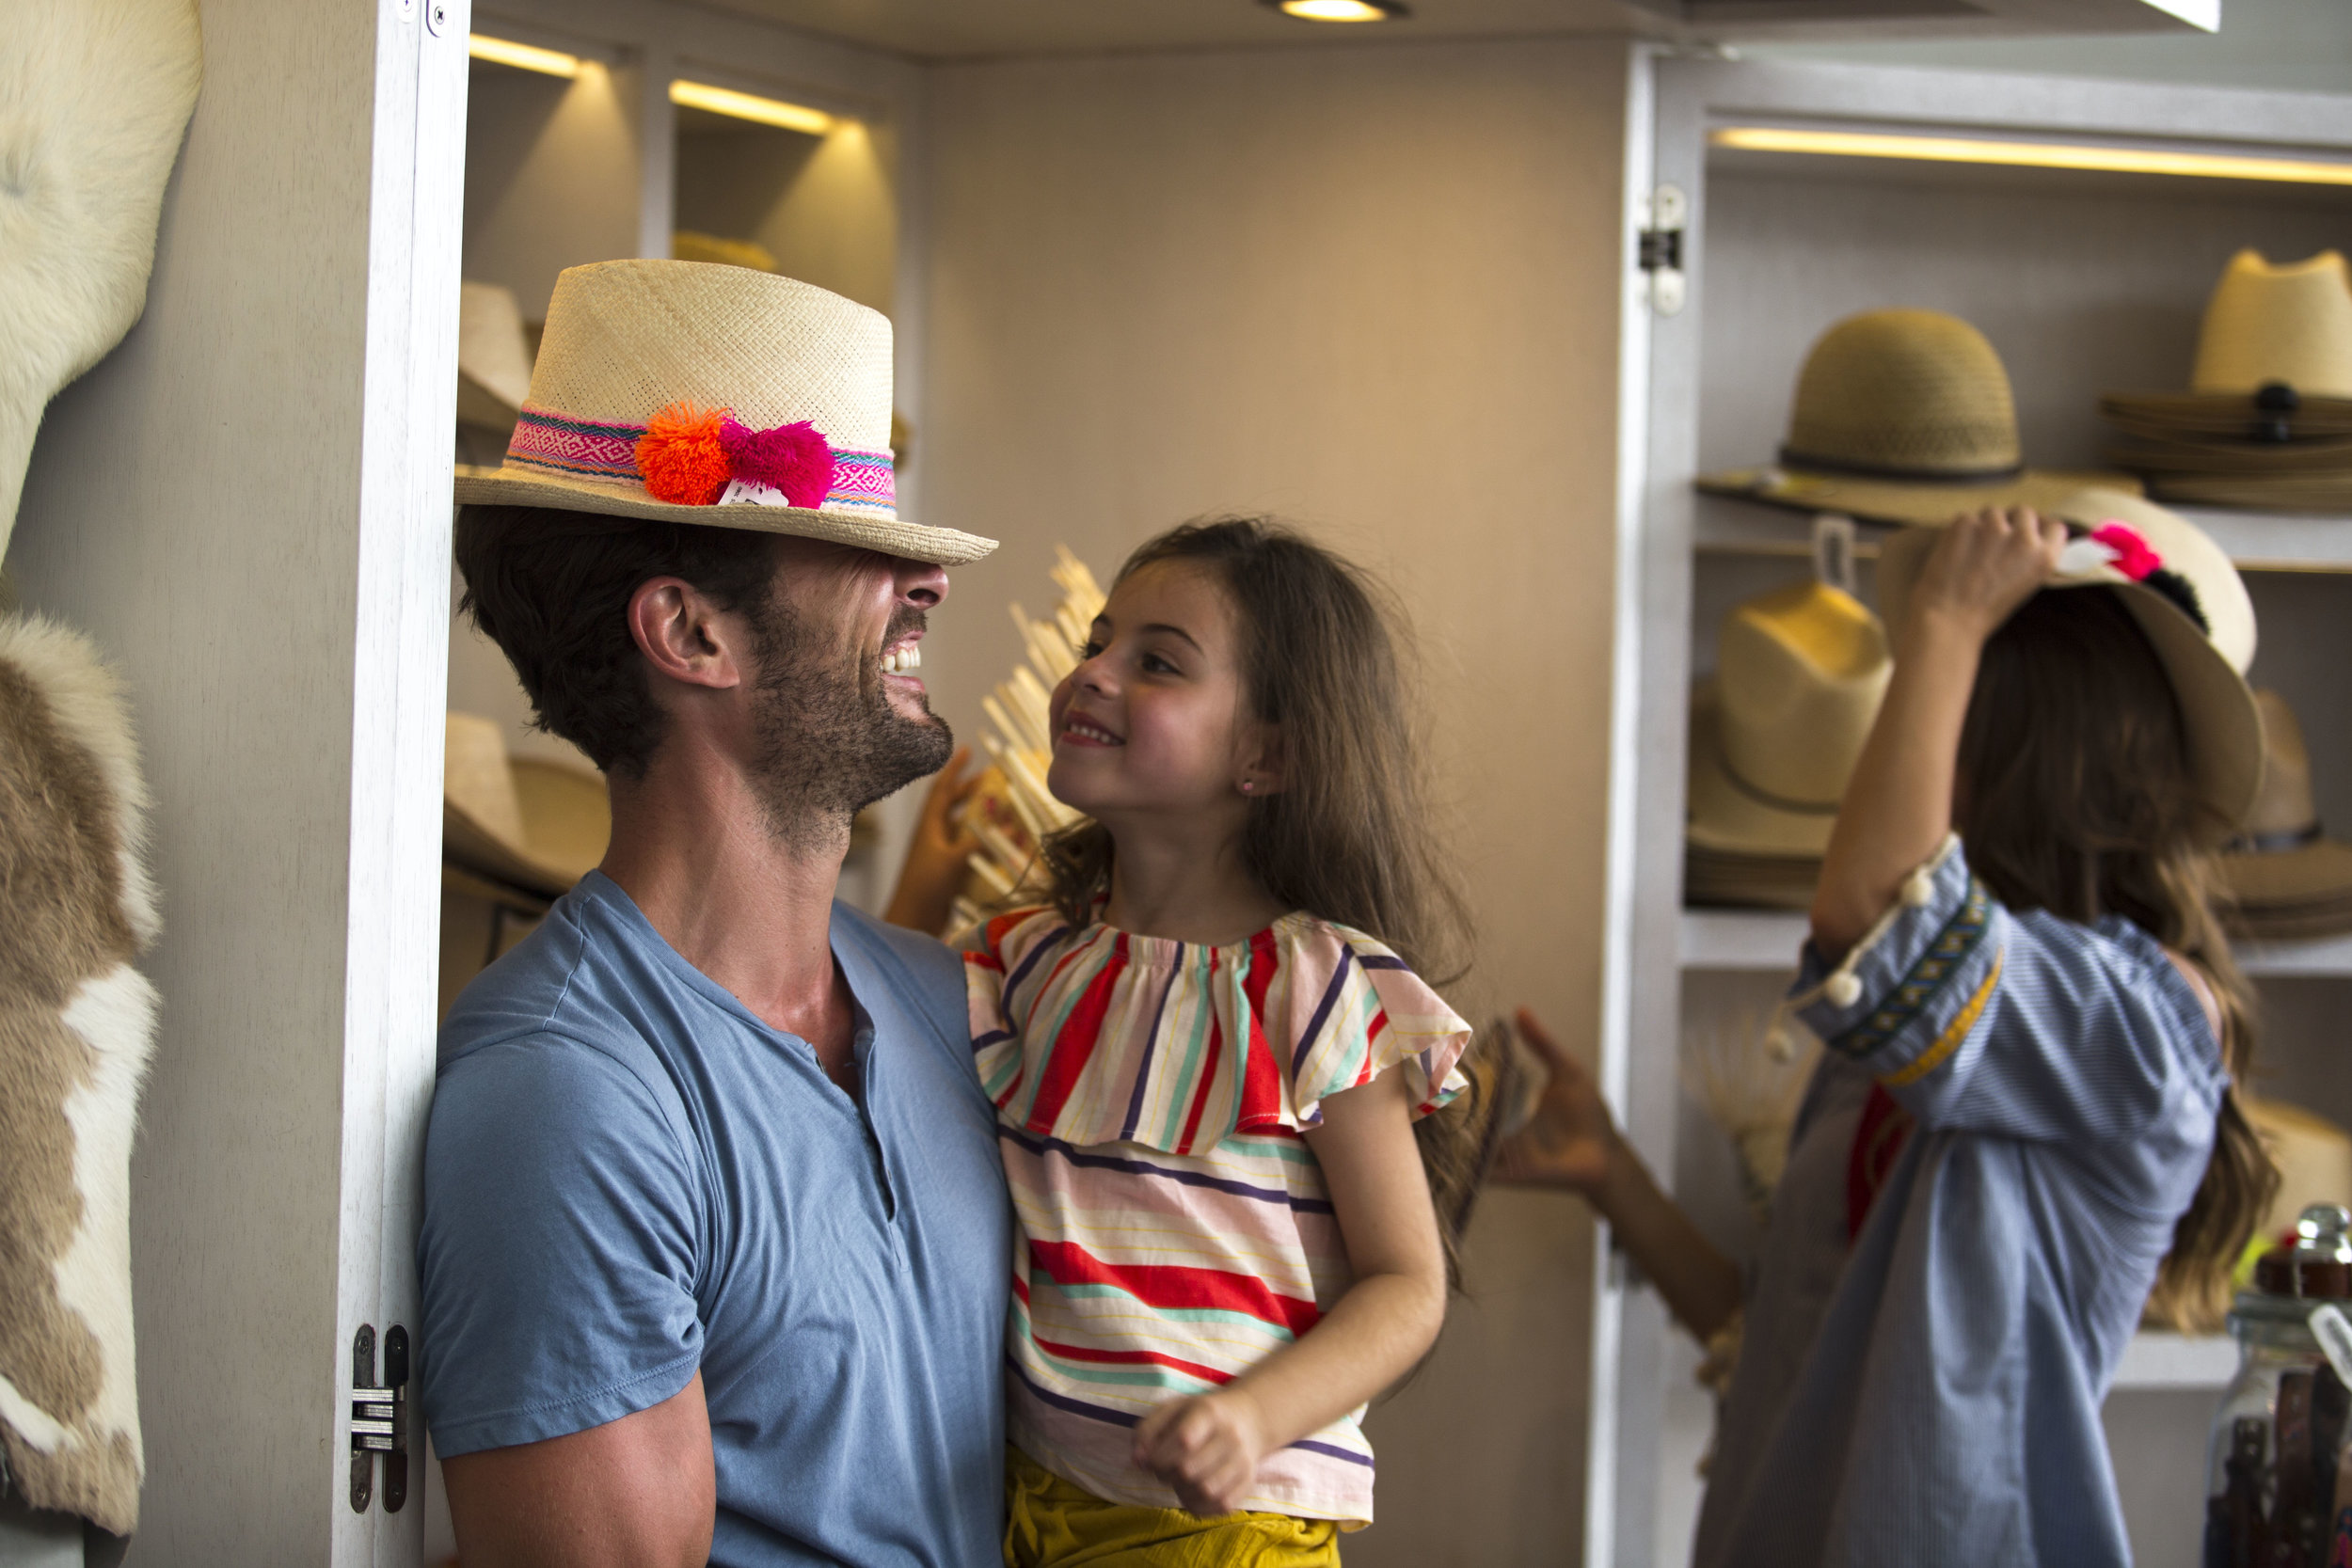 VID_NV_ElMercado_Dad_Girl_Hats.jpg